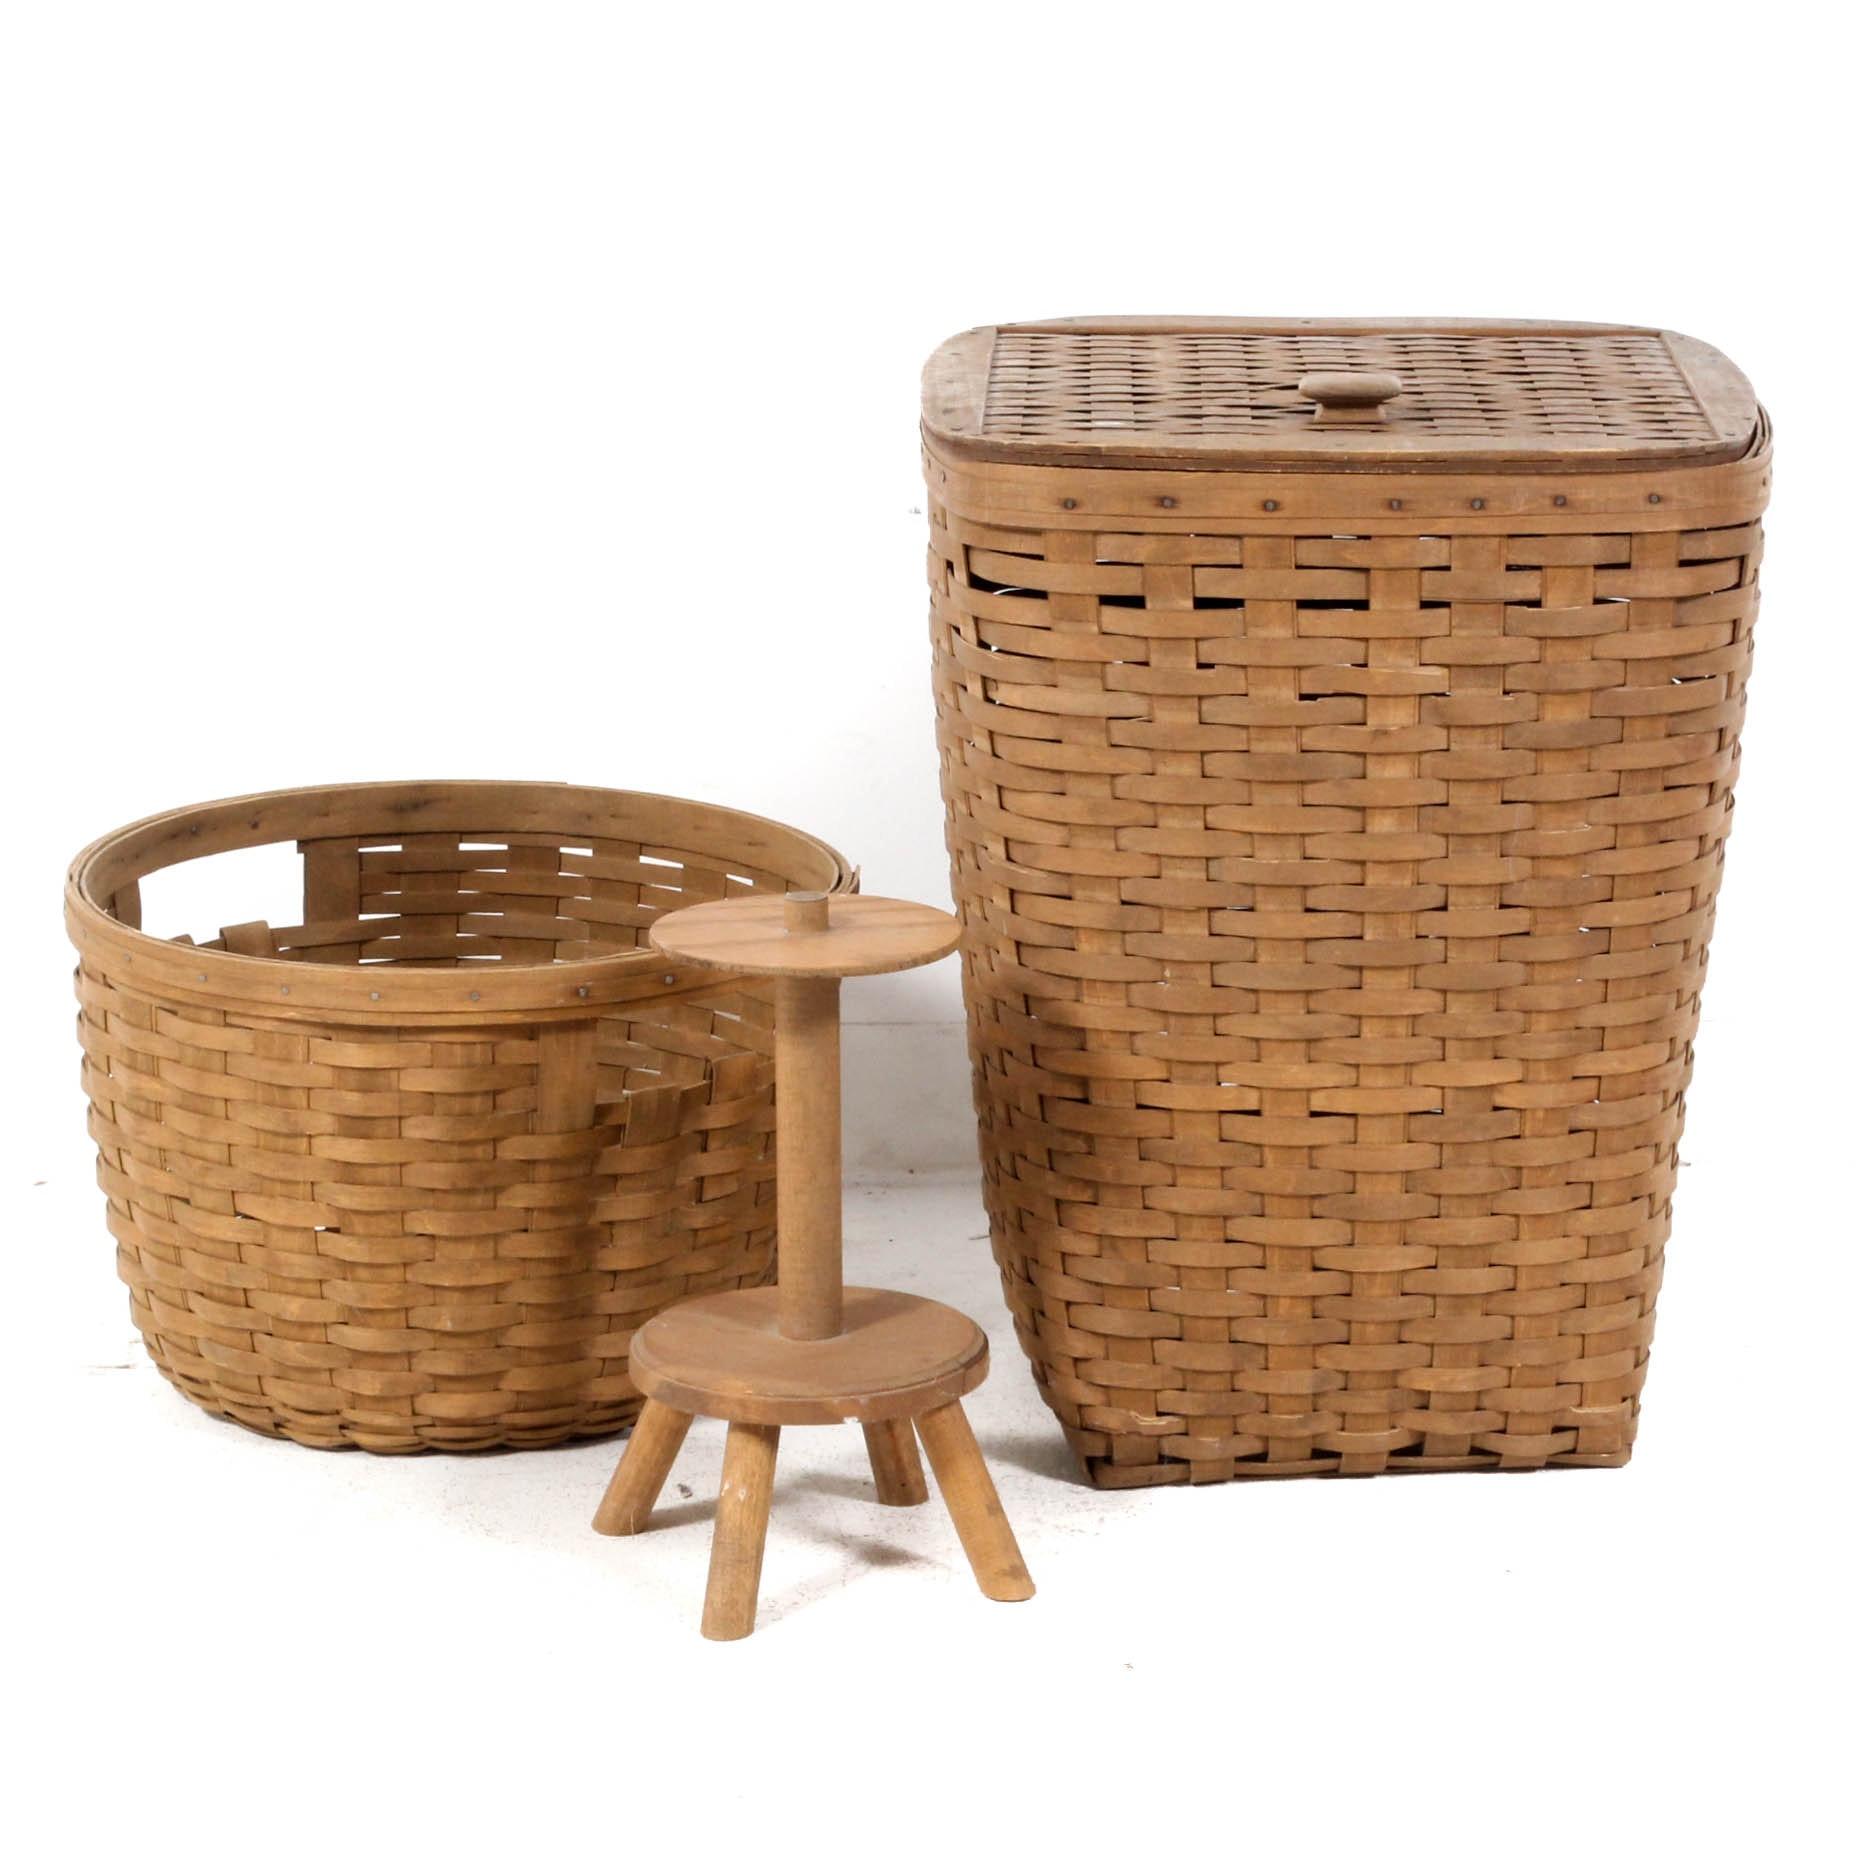 Longaberger Laundry Basket, Sewing Basket and Stand